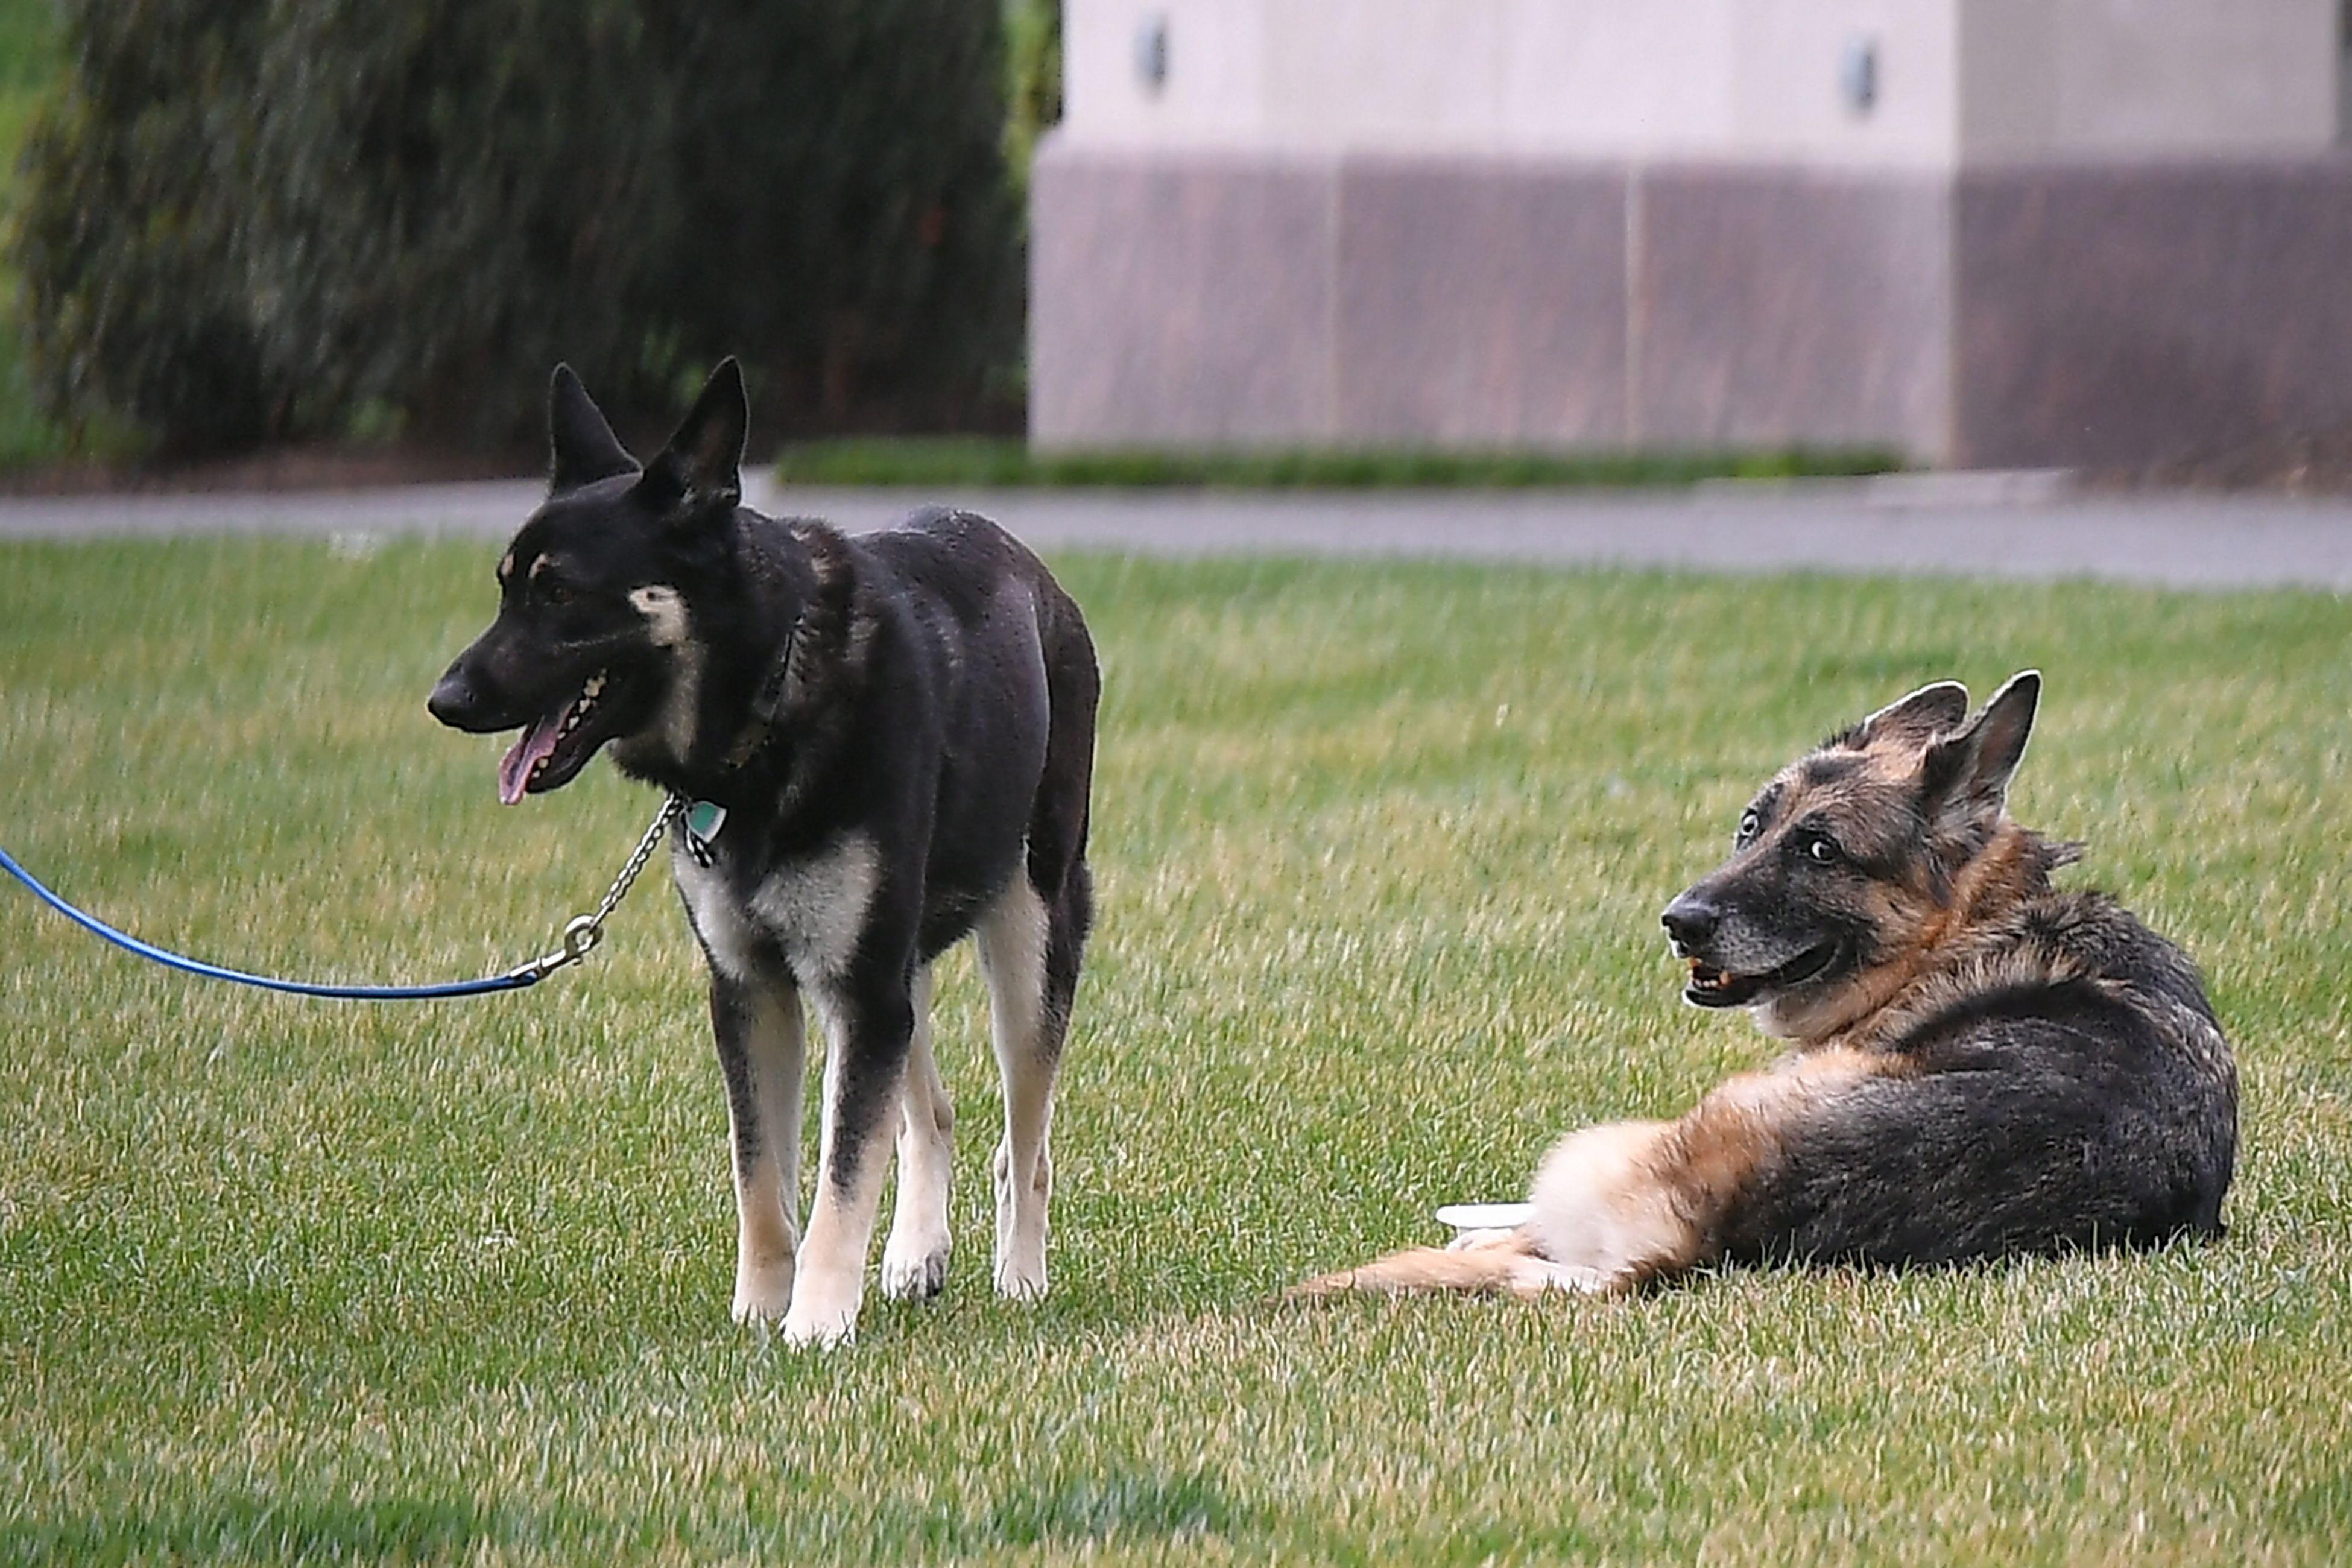 QAnon Believers Suggest Secret Message Behind Announcement of Biden Dog Champ's Death - Newsweek